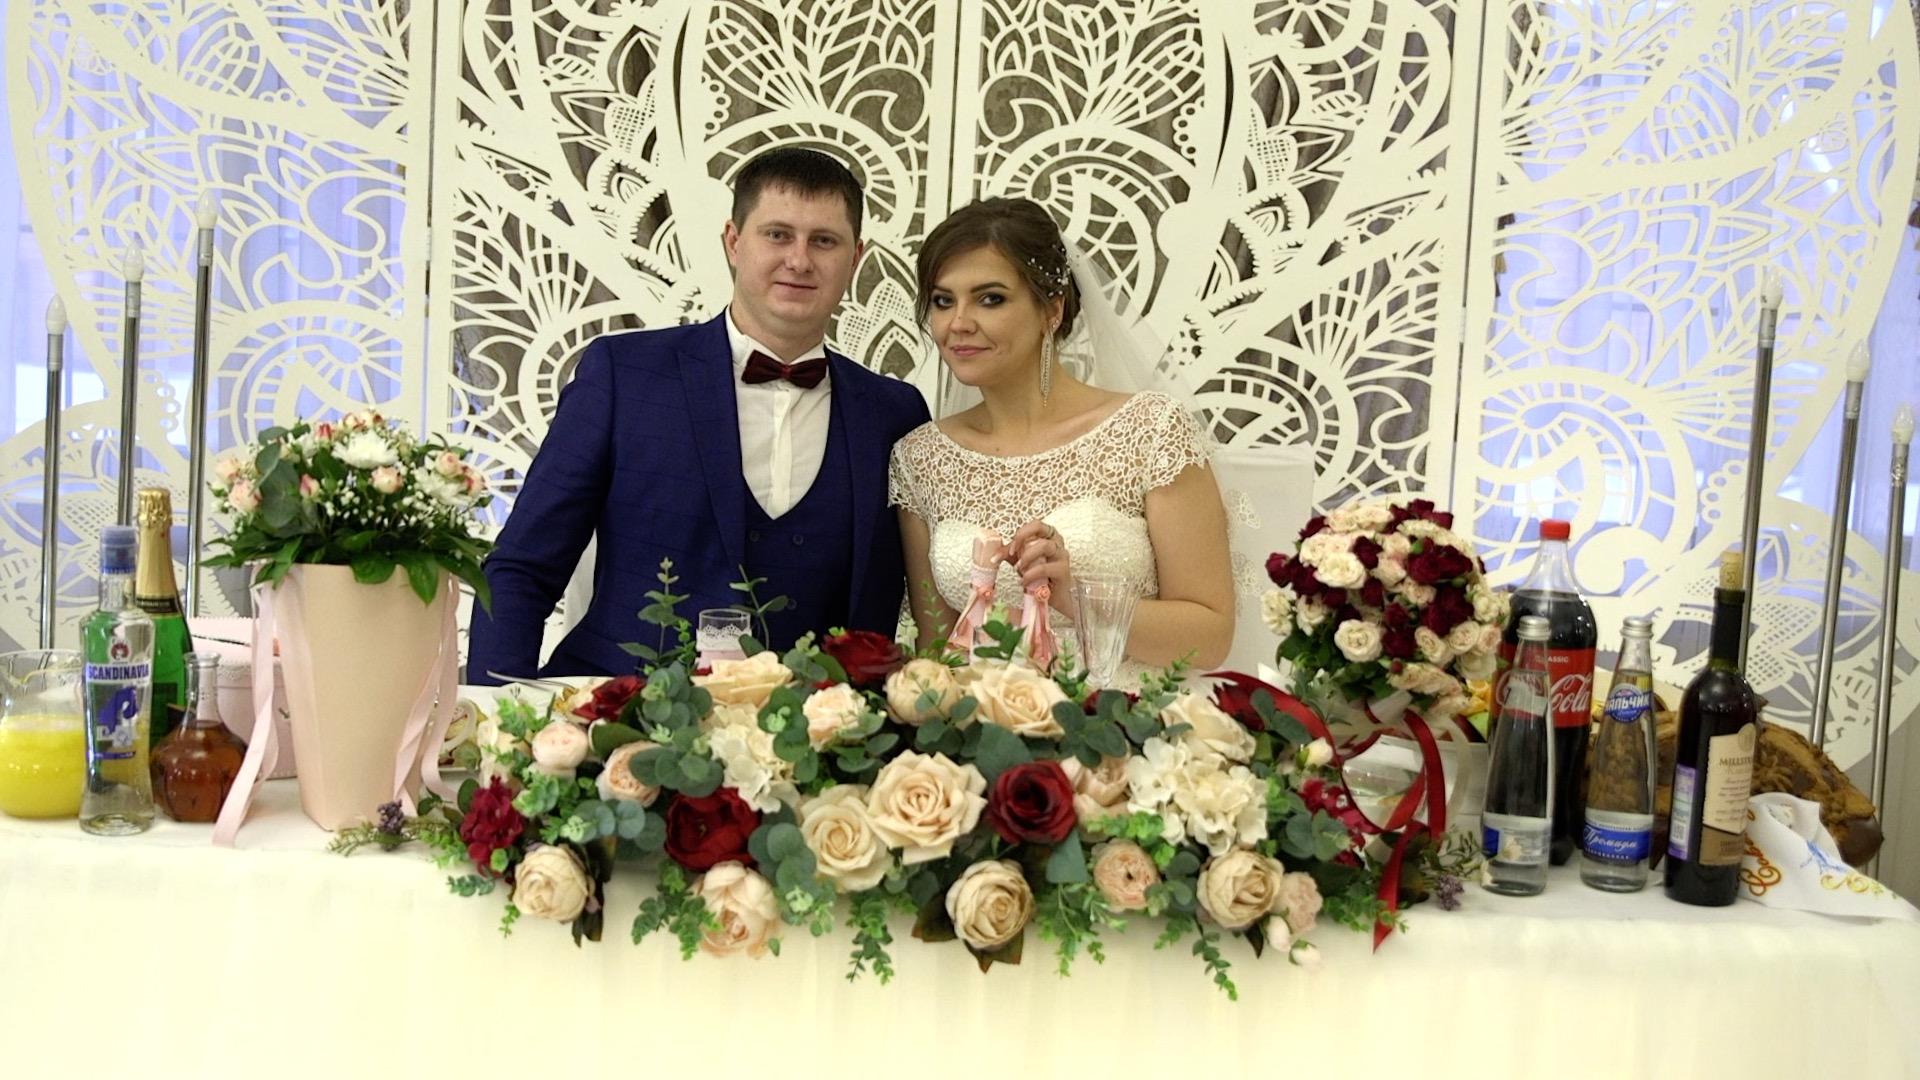 Свадьба среднего уровня цен6809